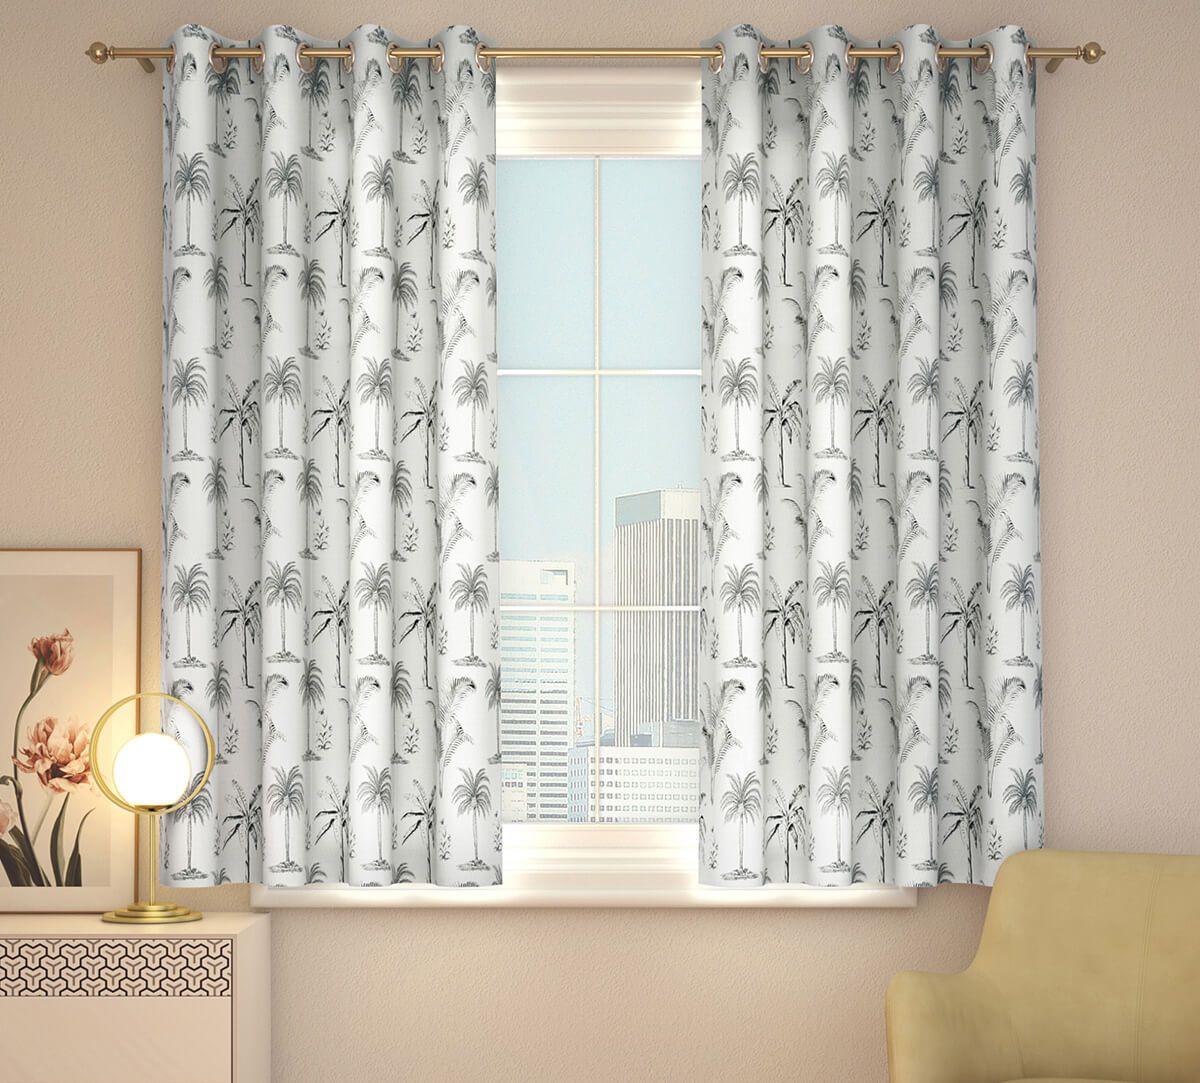 India Circus Monochrome Palms Window Curtain